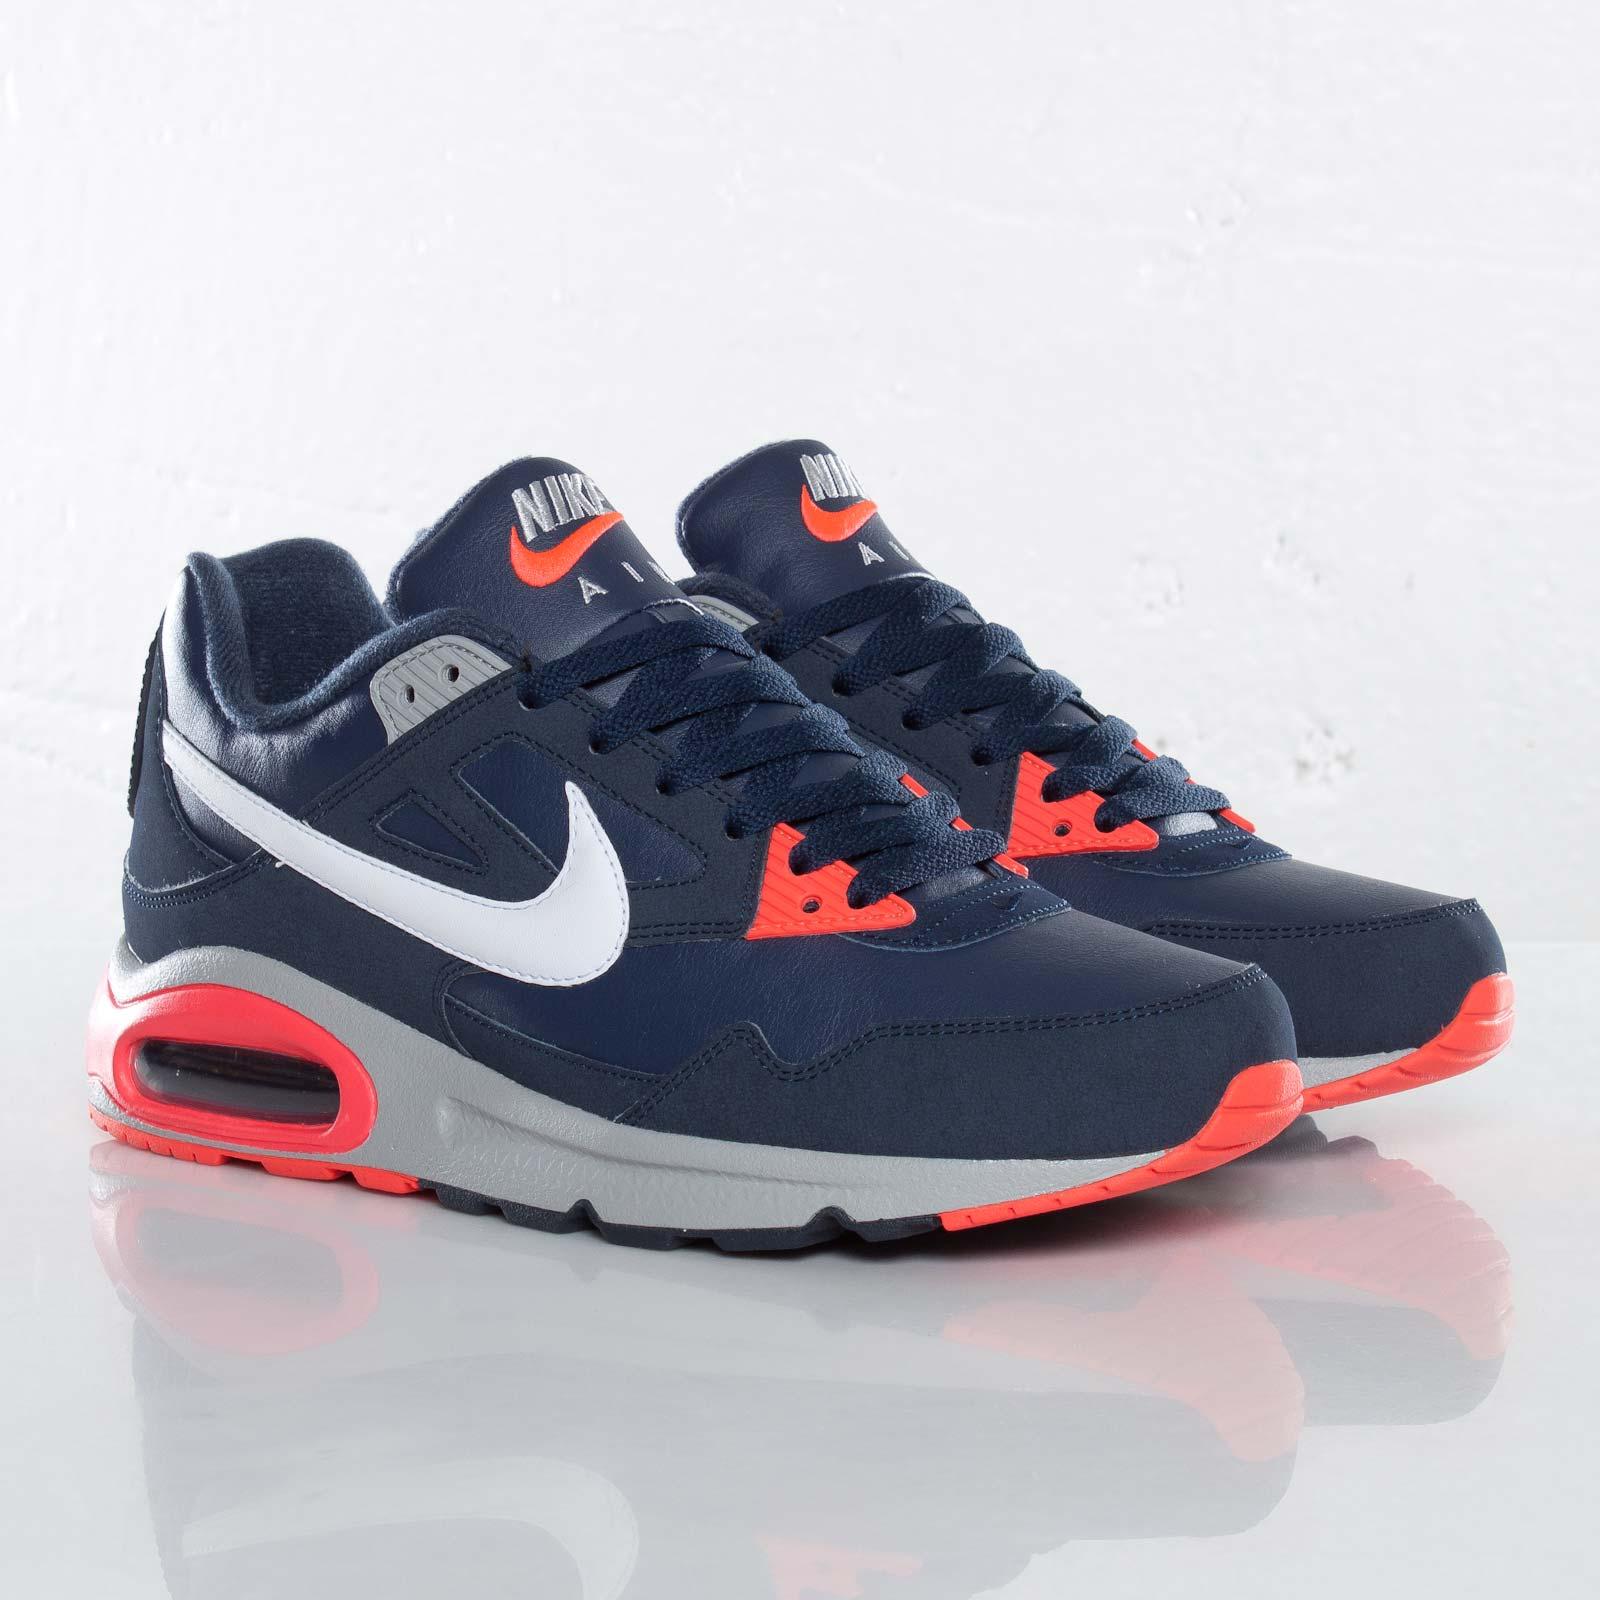 meilleure sélection 7f341 f4c6a Nike Air Max Skyline EU - 343902-406 - Sneakersnstuff ...